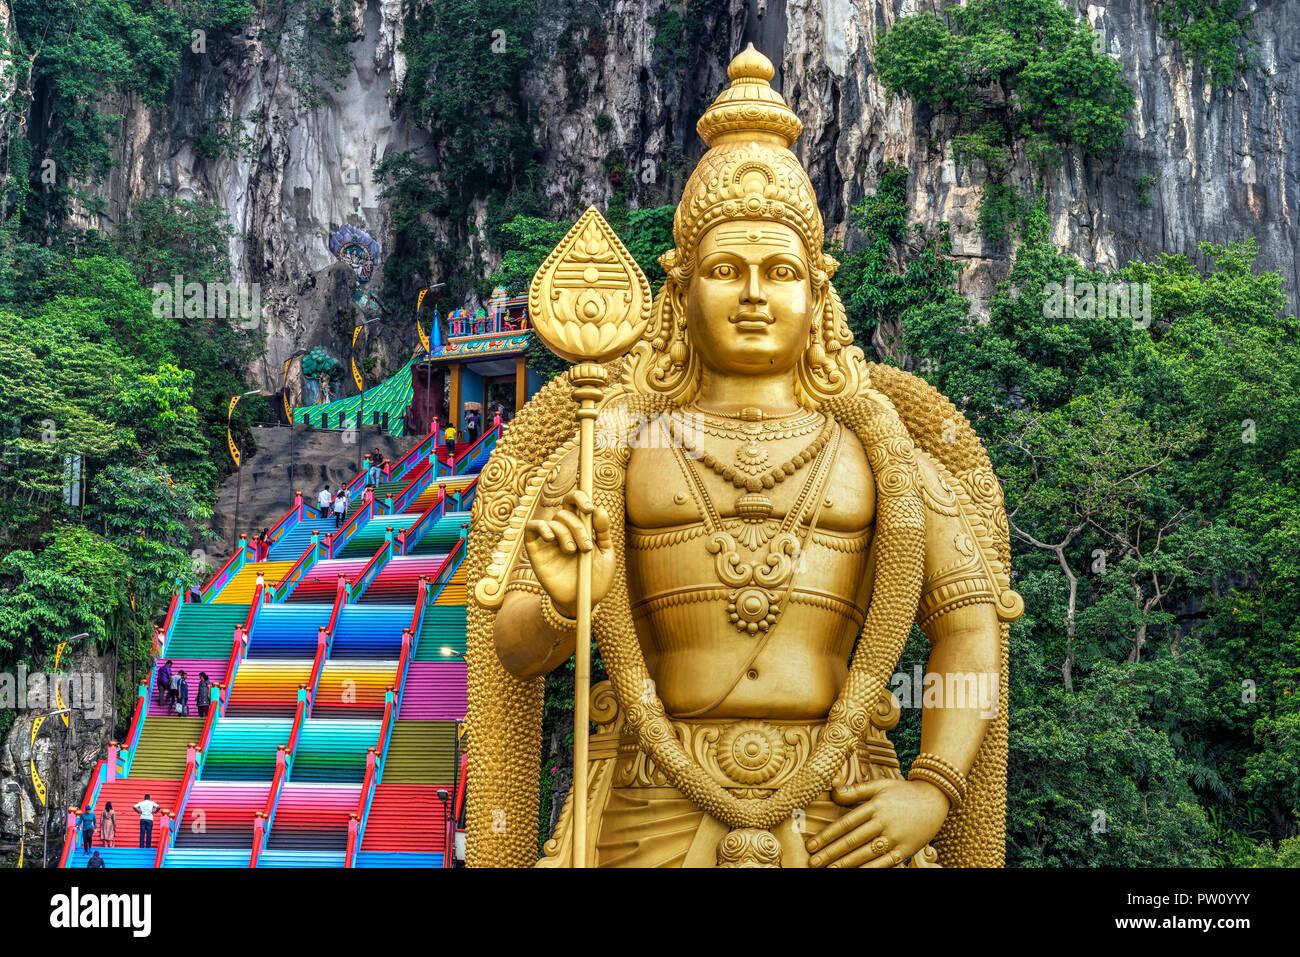 Entrance to Batu Caves with the Murugan statue, Selangor, Kuala Lumpur, Malaysia - Stock Image